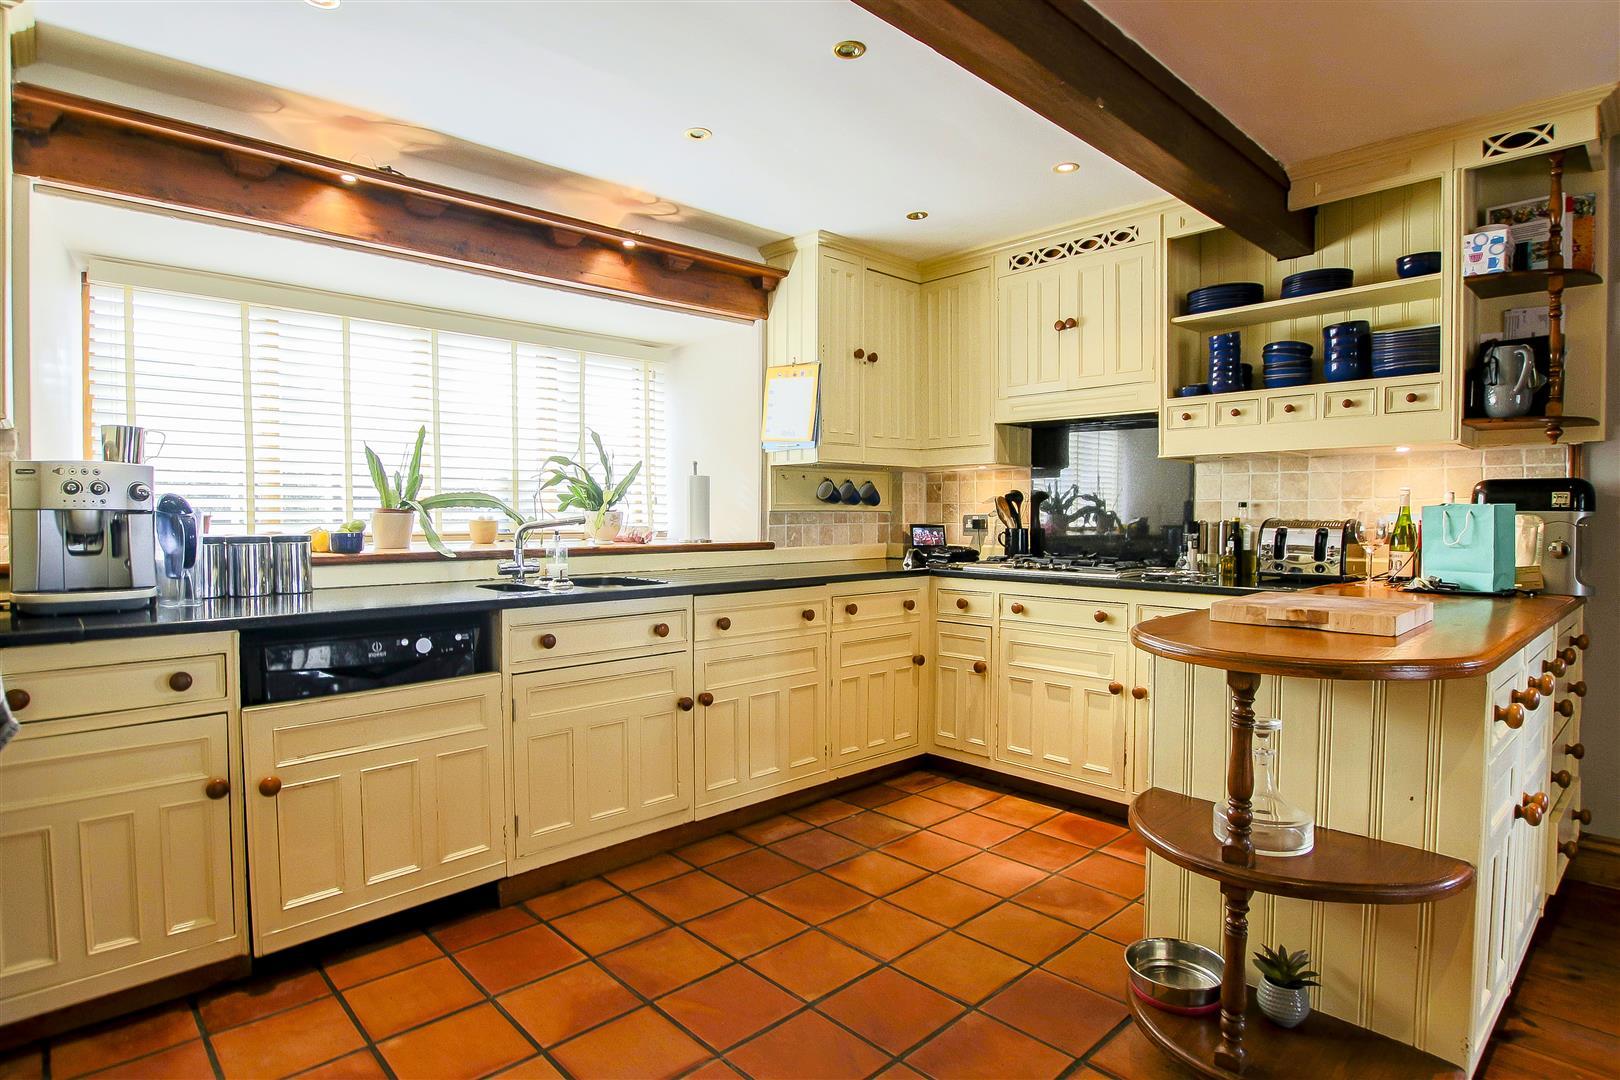 5 Bedroom Barn Conversion For Sale - 3.jpg